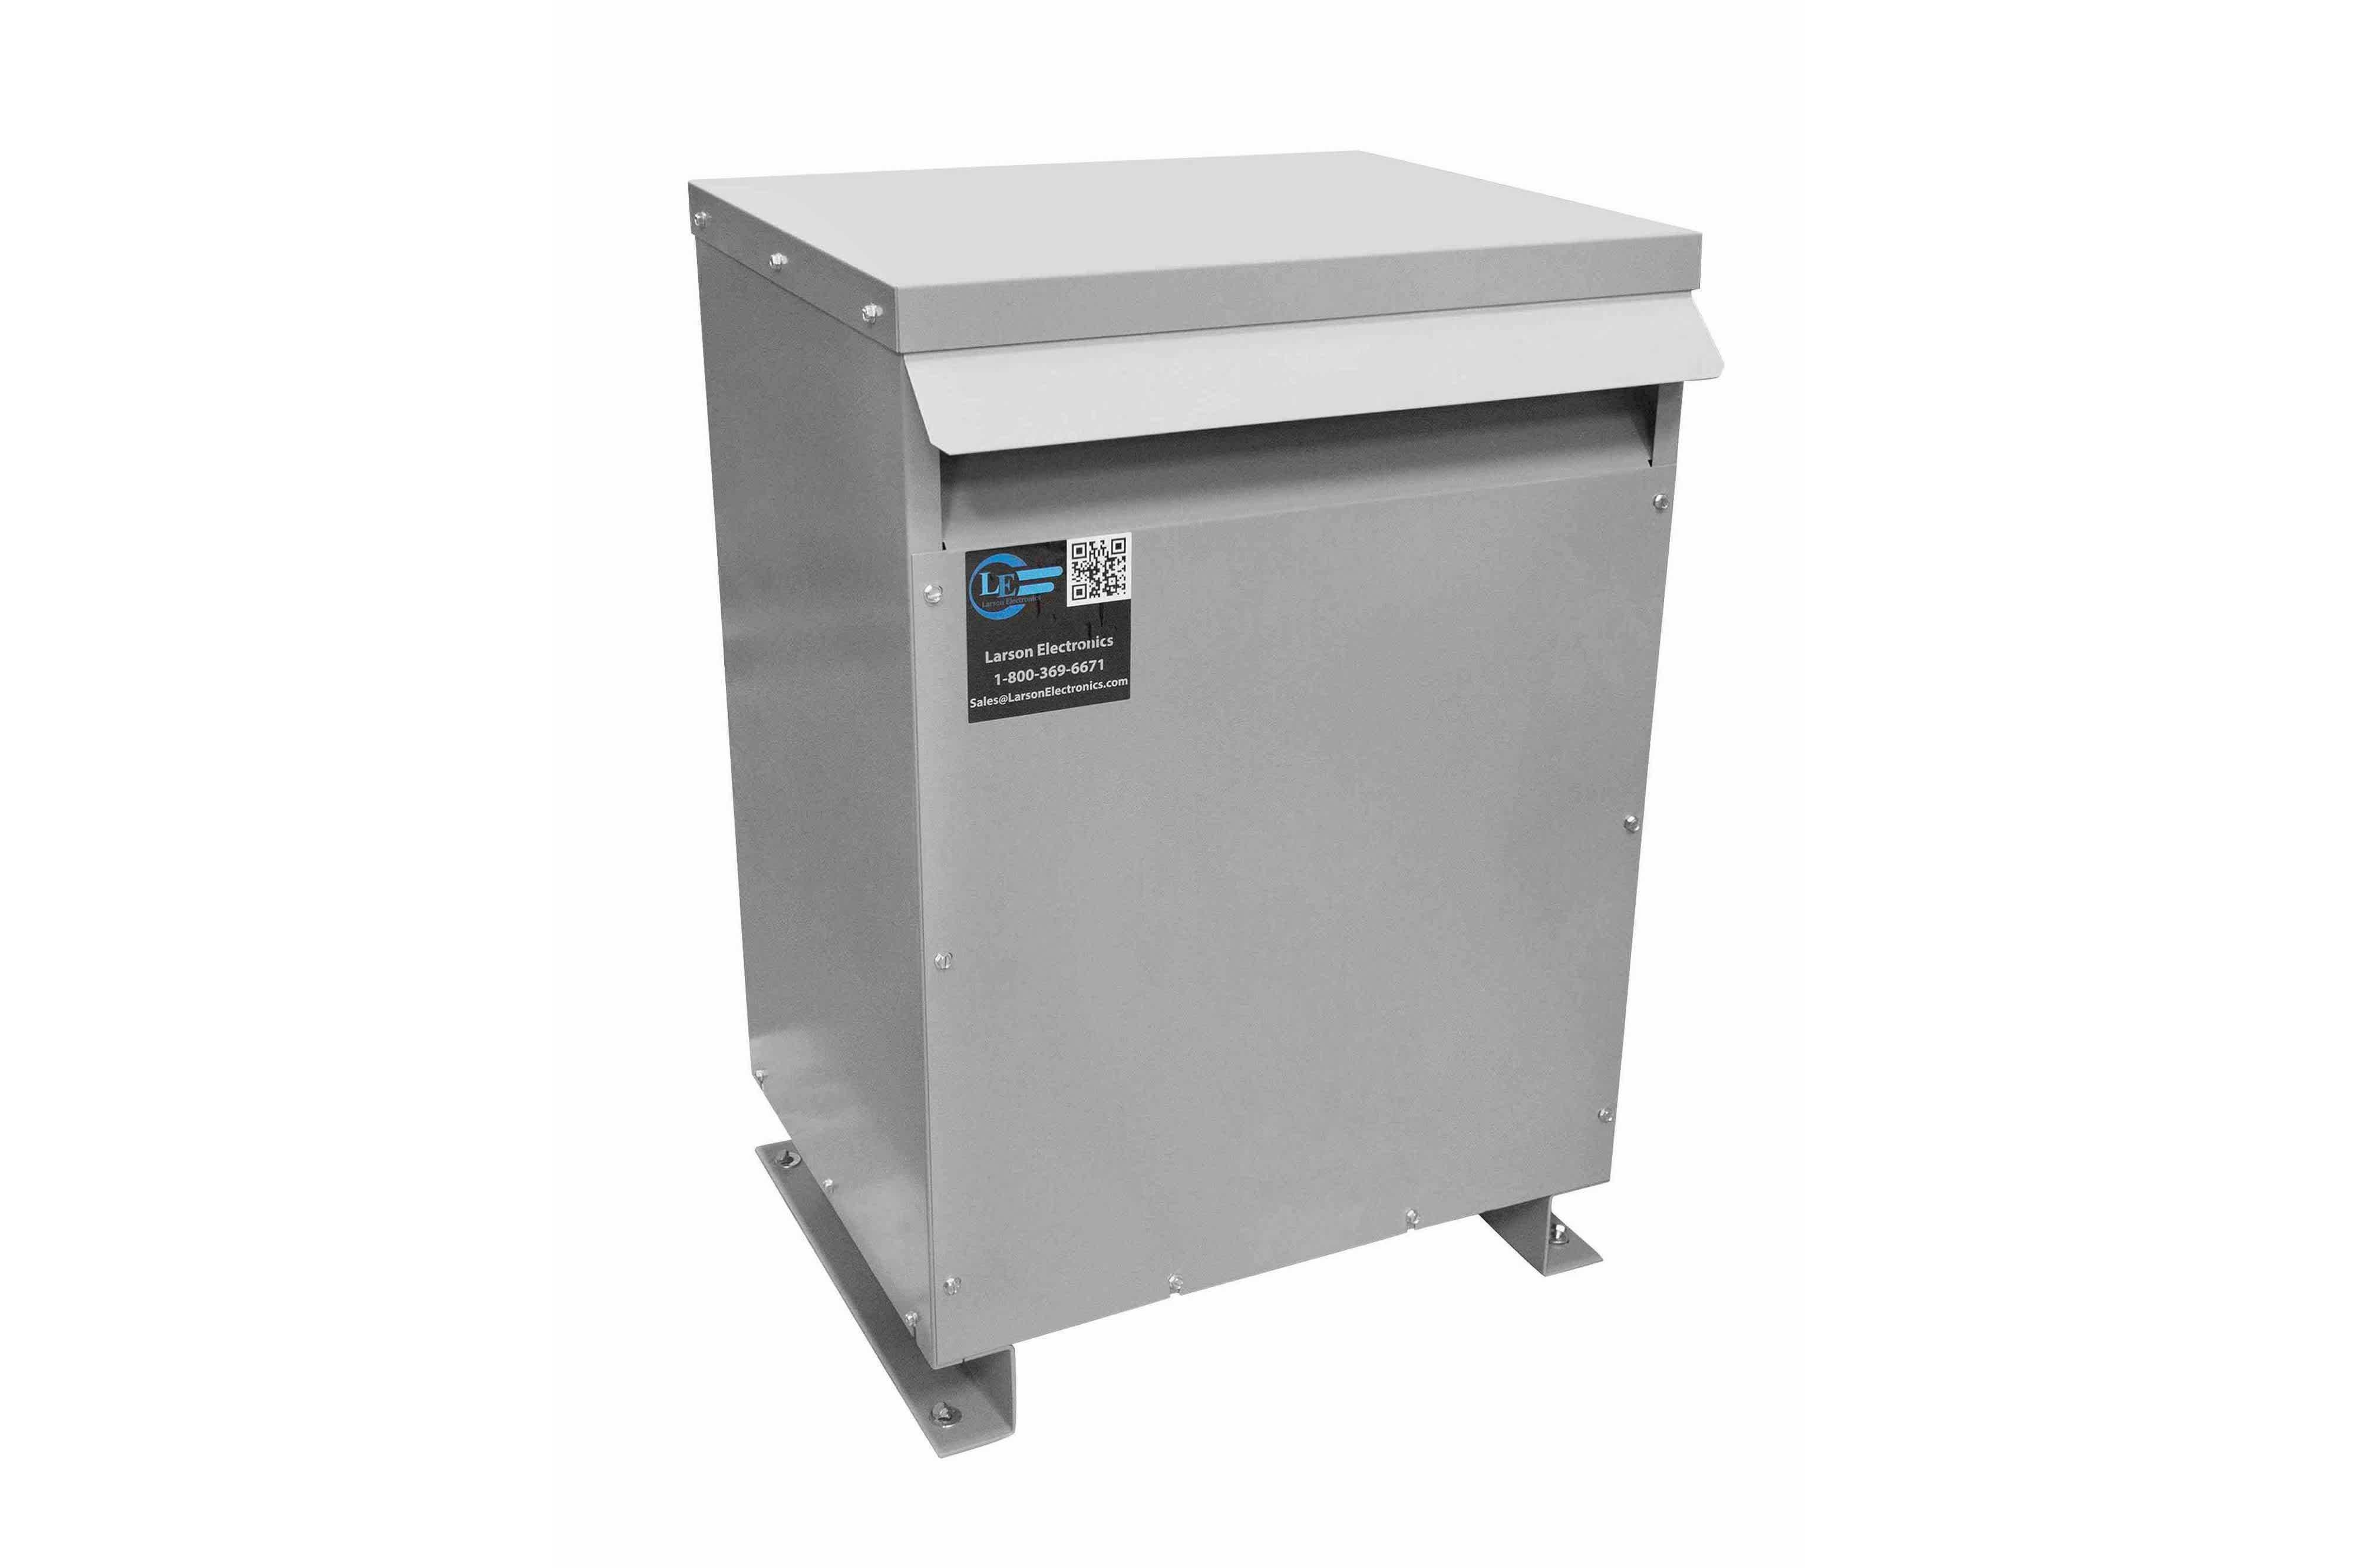 275 kVA 3PH Isolation Transformer, 480V Wye Primary, 208Y/120 Wye-N Secondary, N3R, Ventilated, 60 Hz